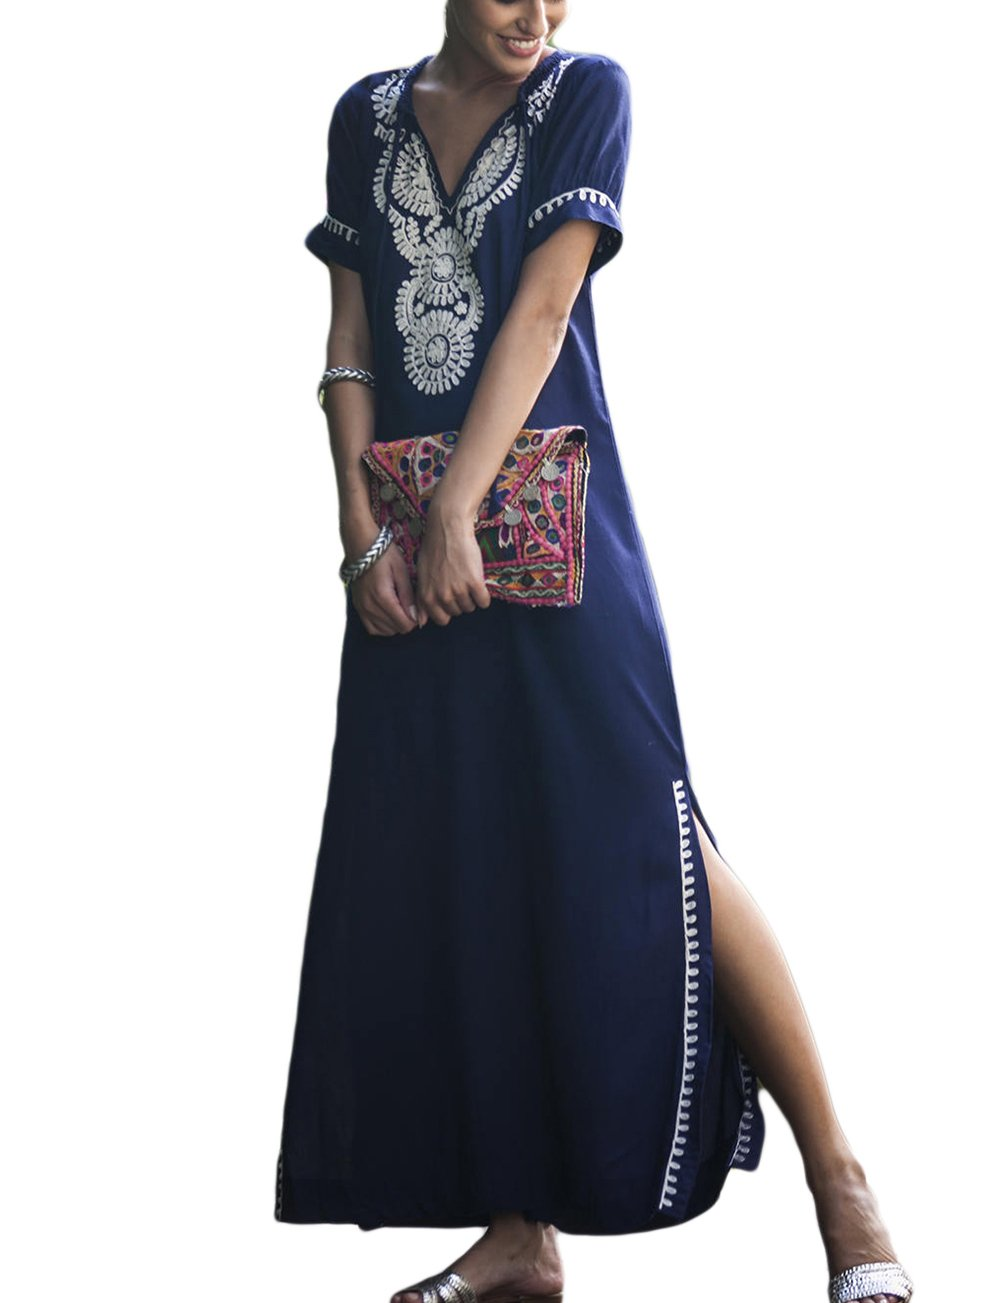 Bsubseach V Neck Short Sleeve Embroidery Beach Dress Swimsuit Cover up Women Swimwear Long Turkish Kaftan Caftan Navy Blue